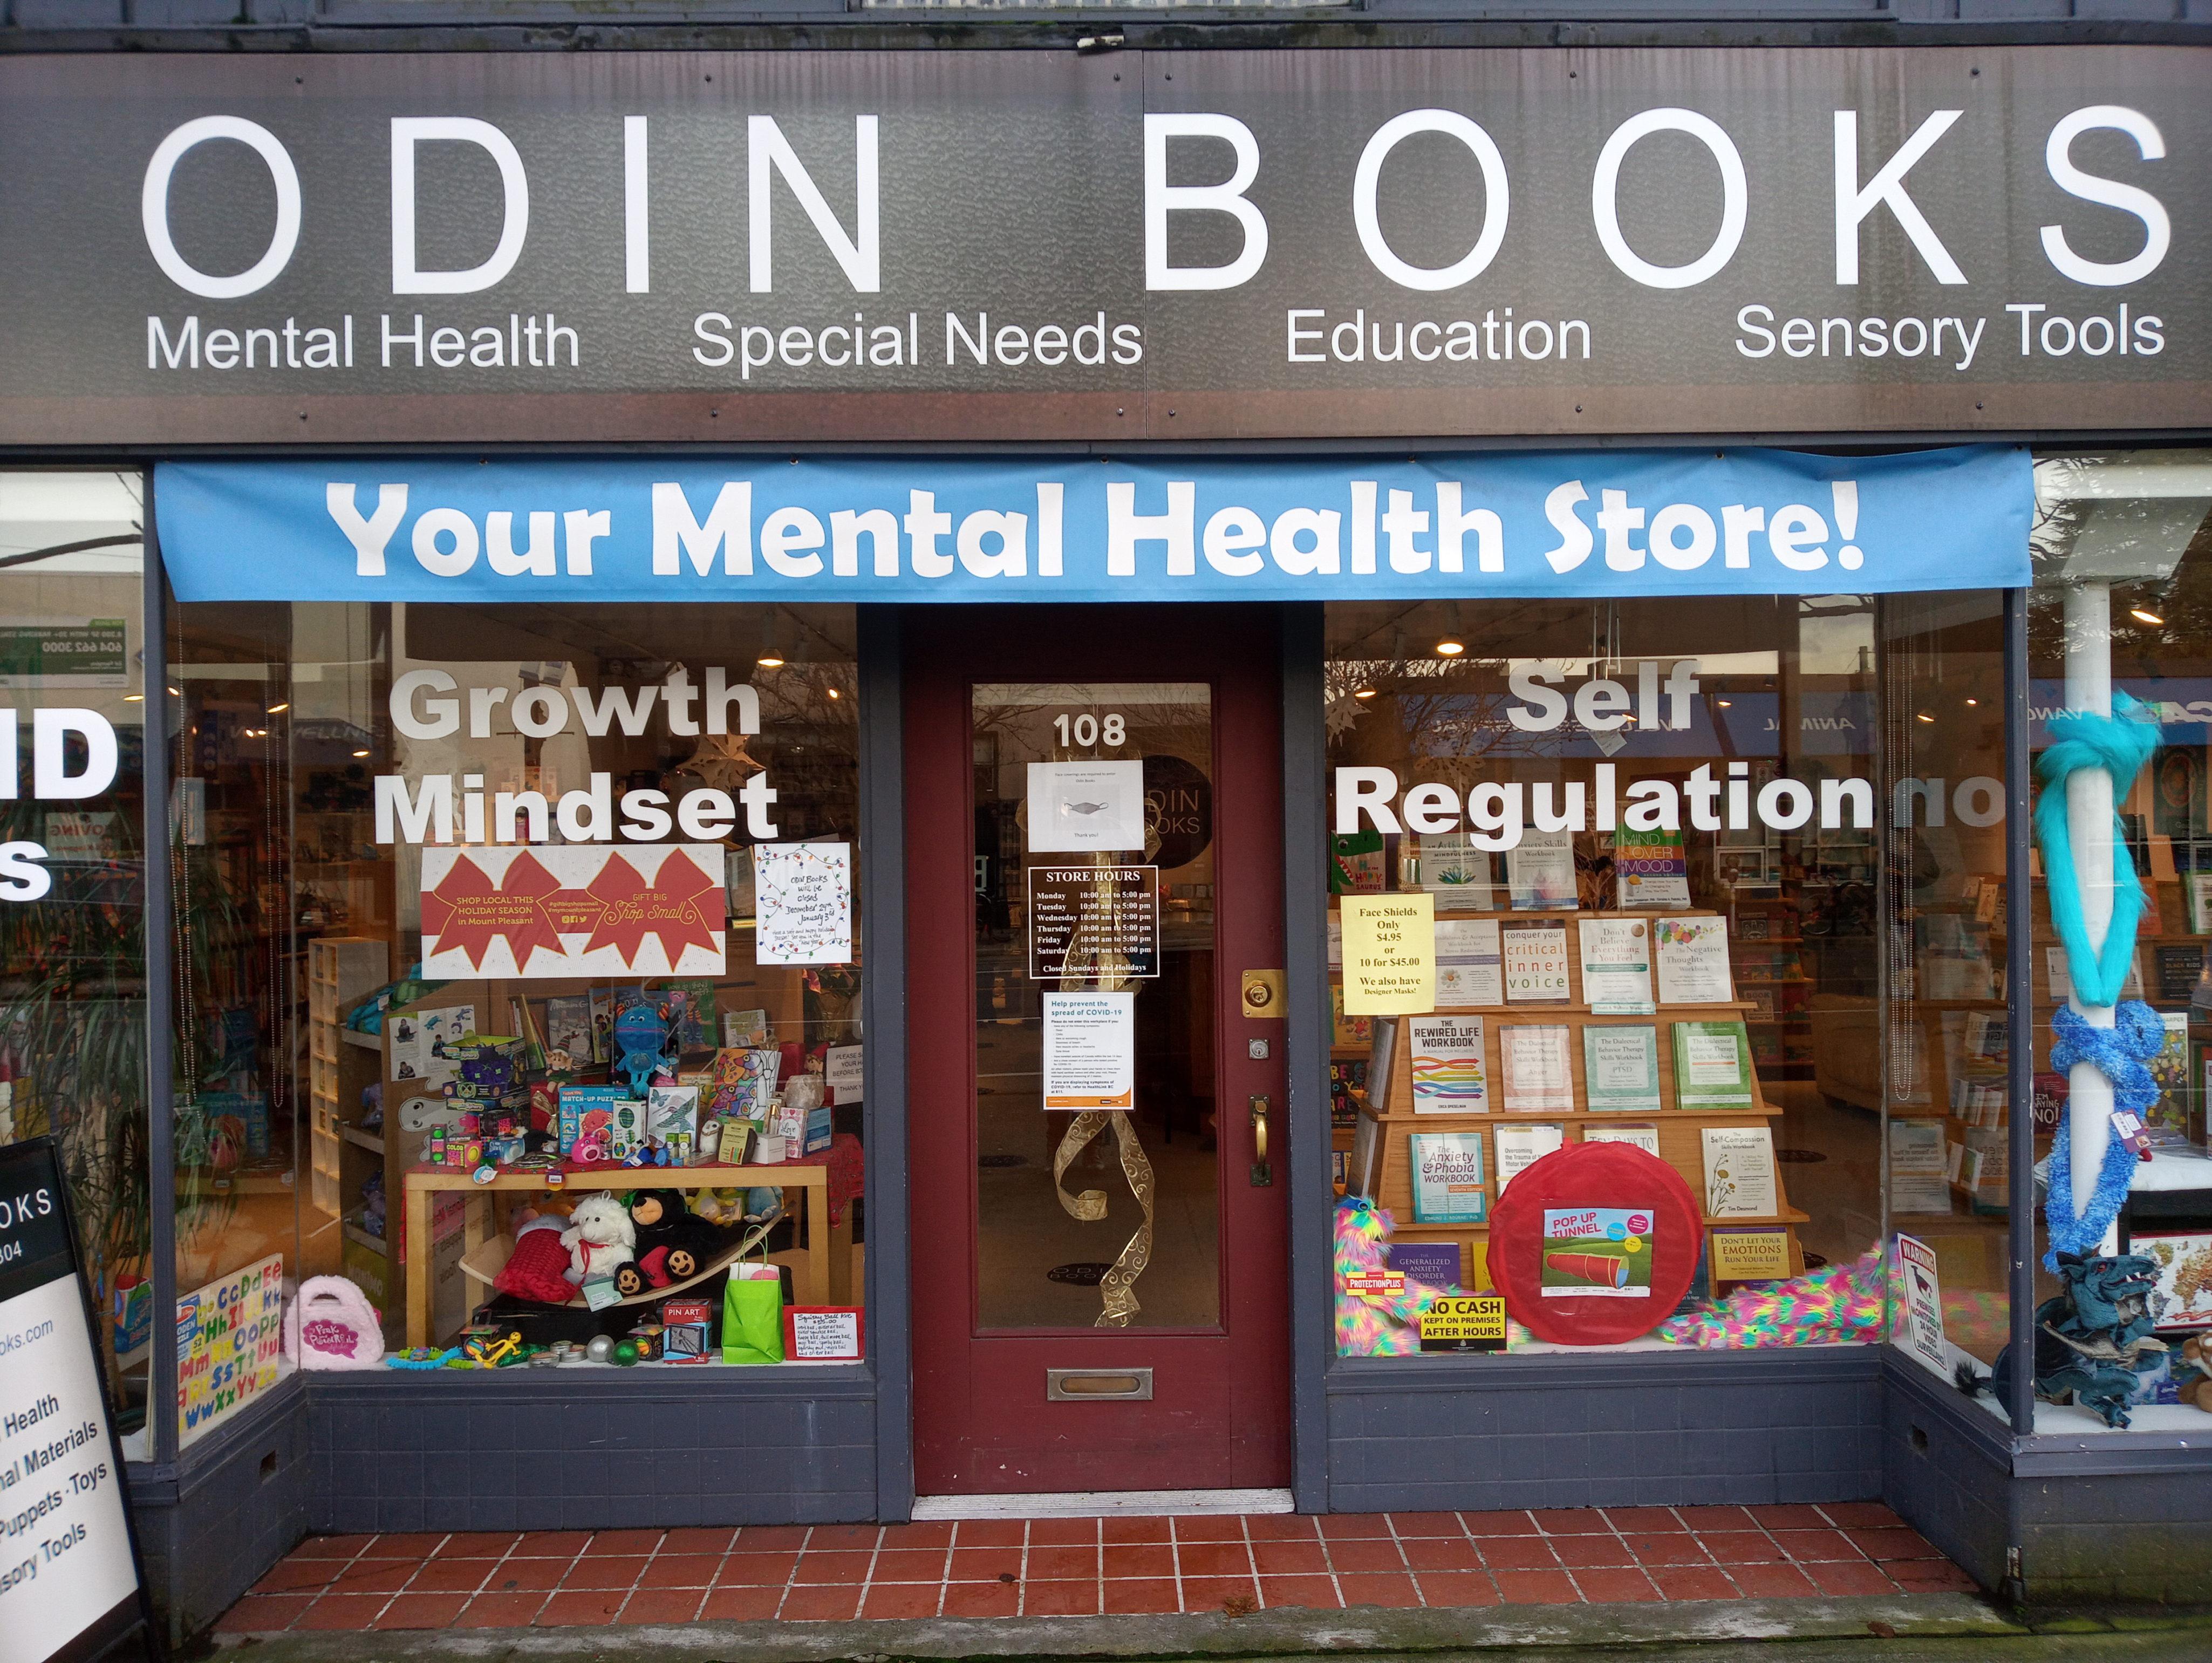 Odin Books storefront